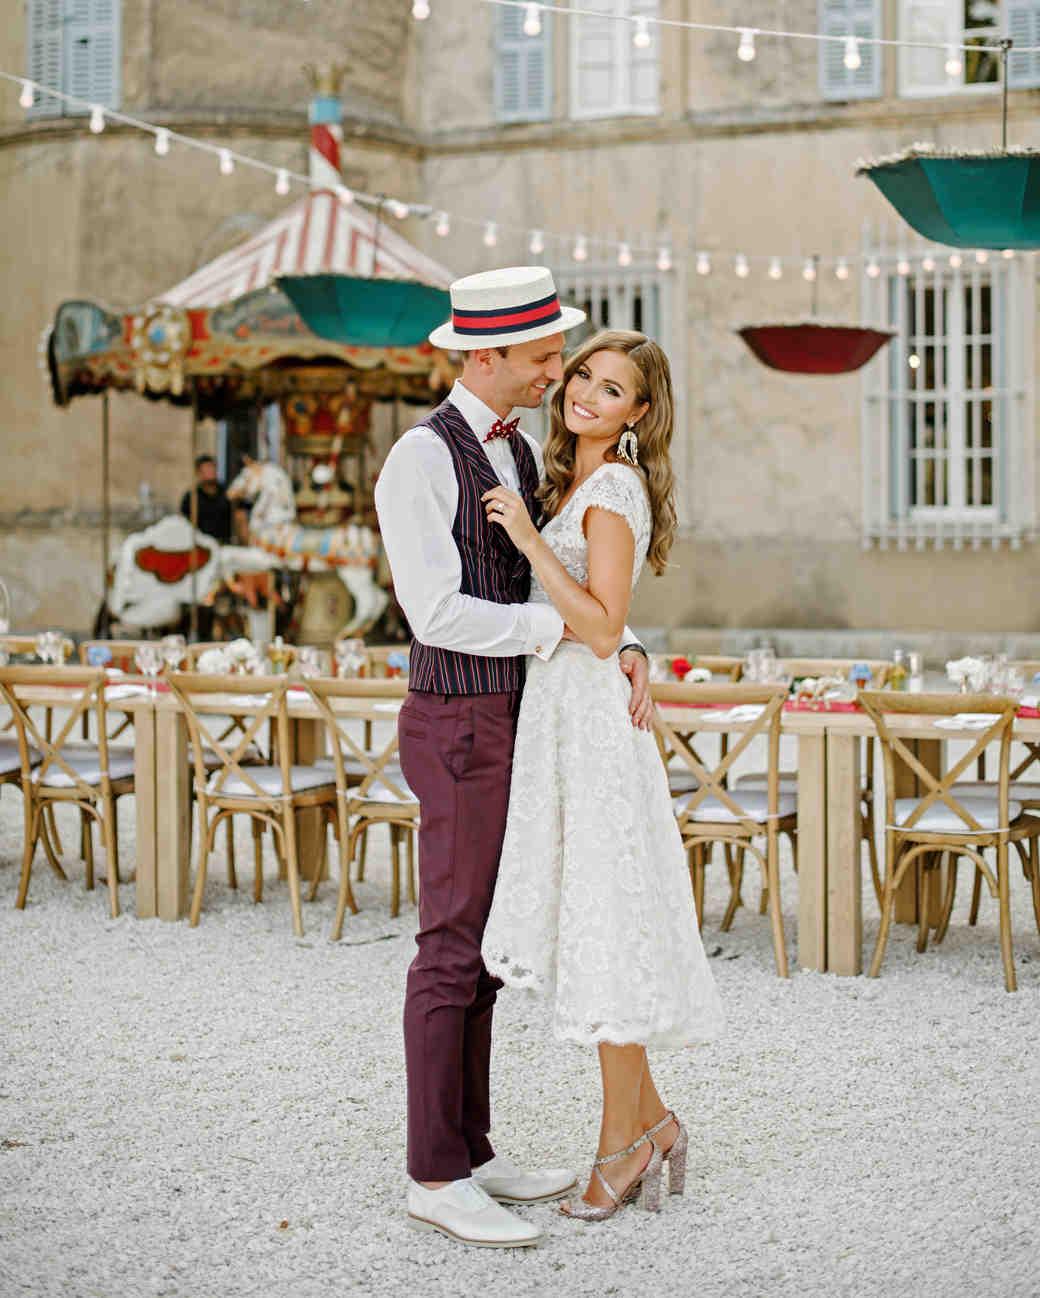 lara kjell circus party couple dance